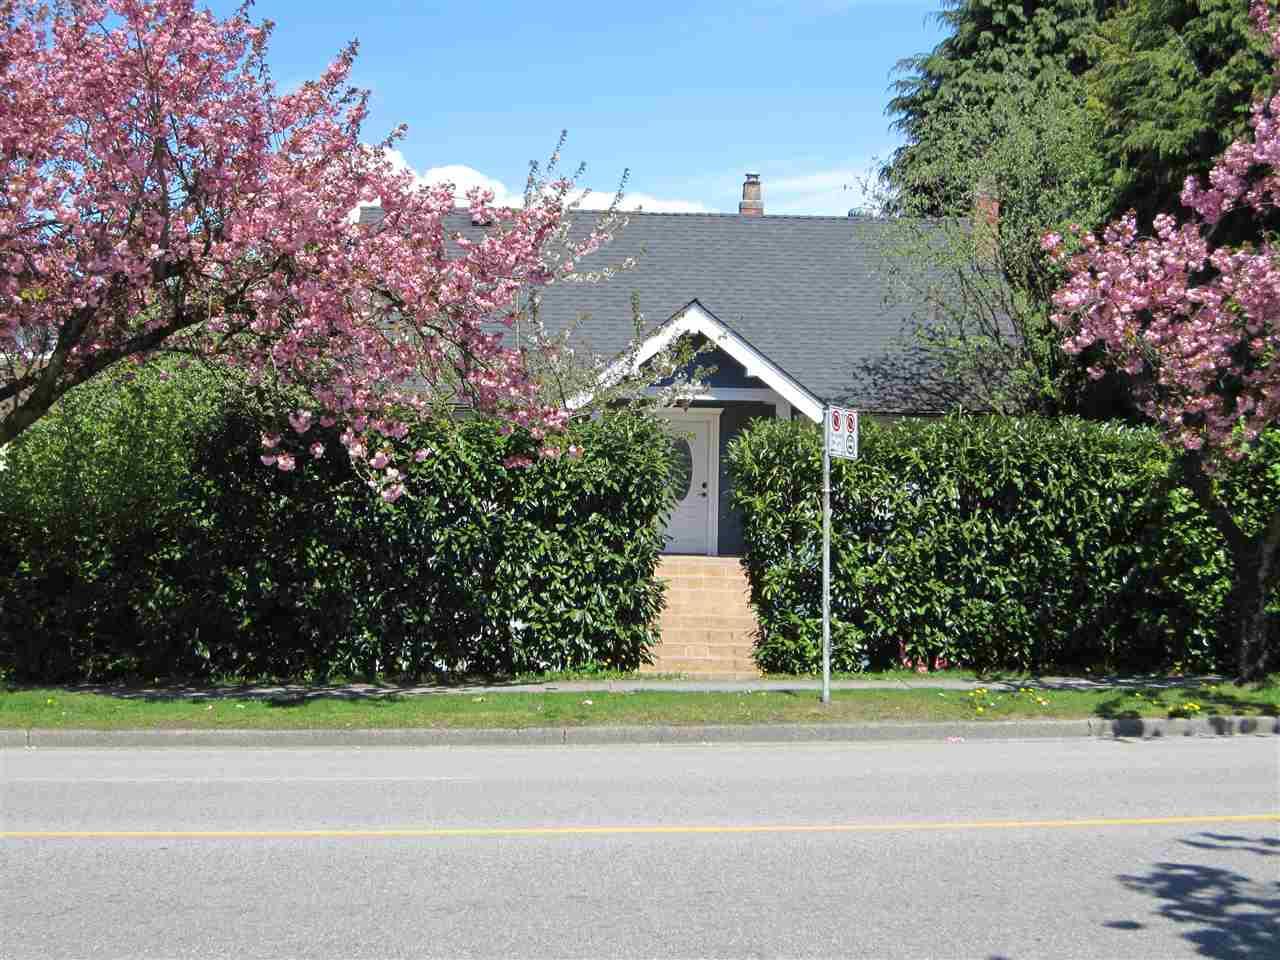 15 W KING EDWARD AVENUE, Vancouver, BC V5Y 2H6